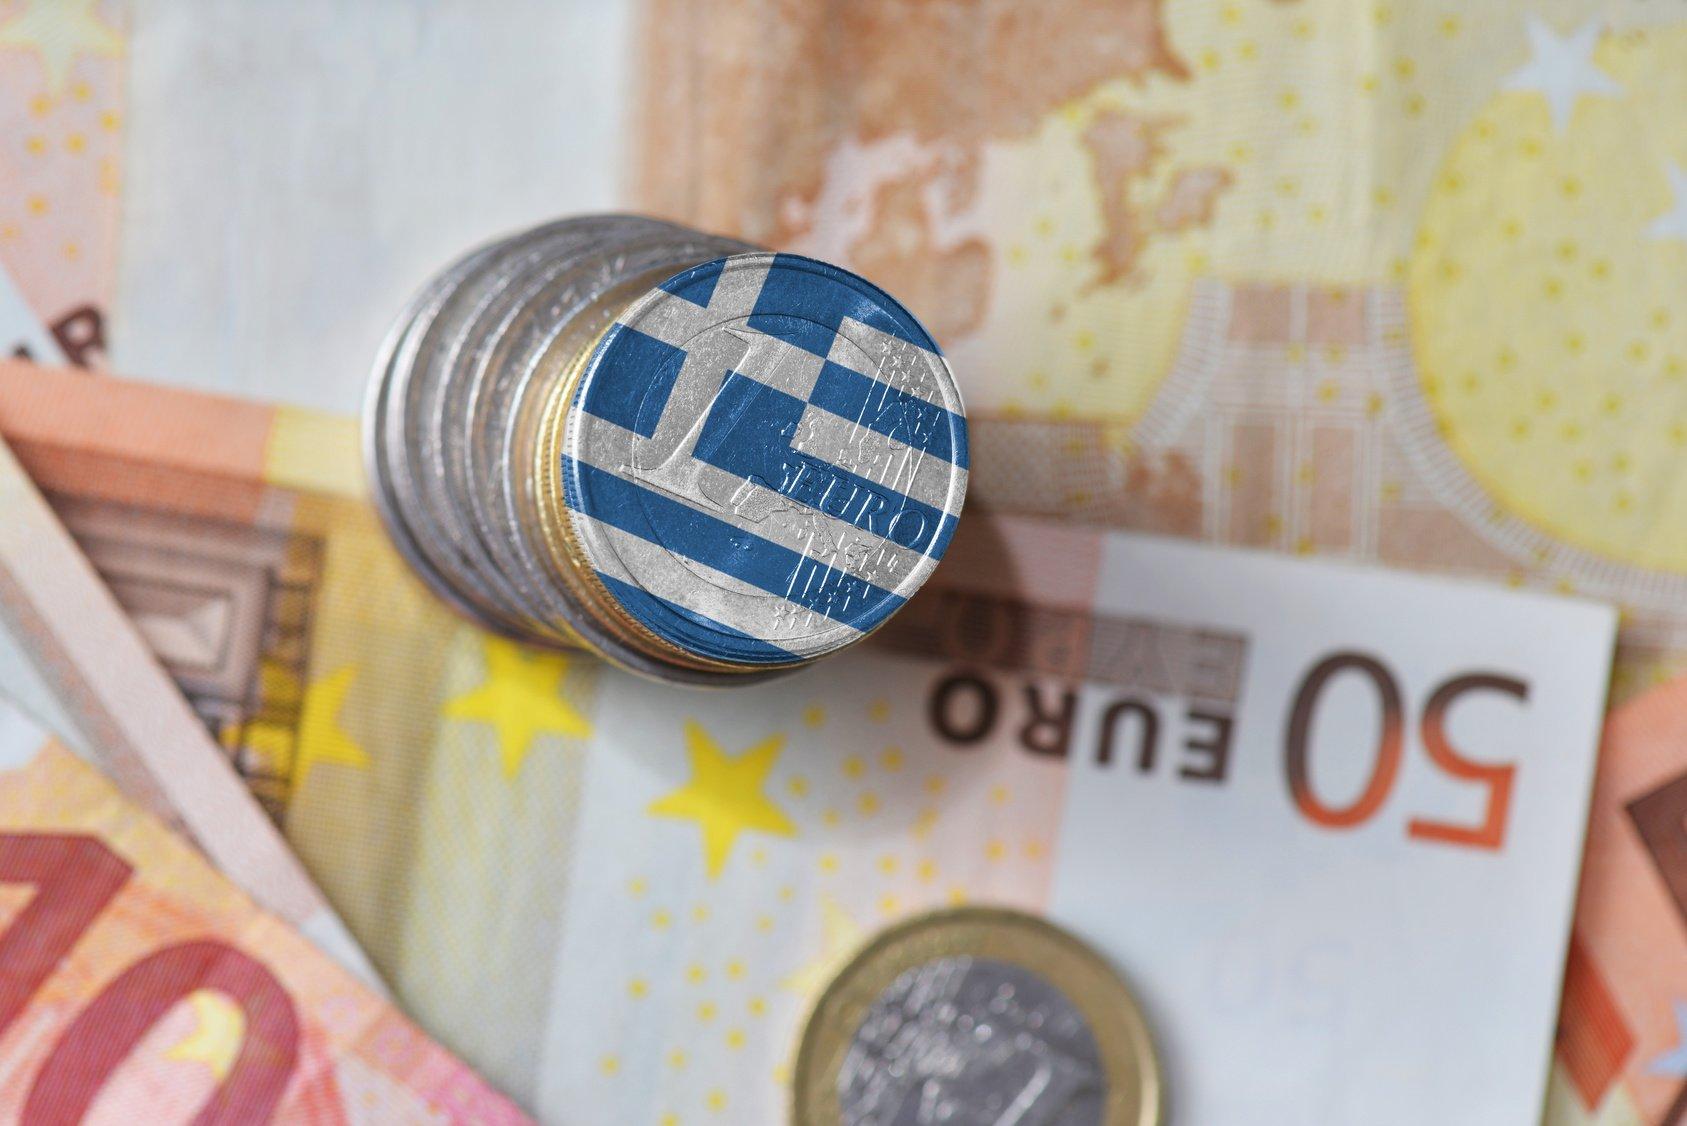 Primary surplus target overshot by 3 billion euros